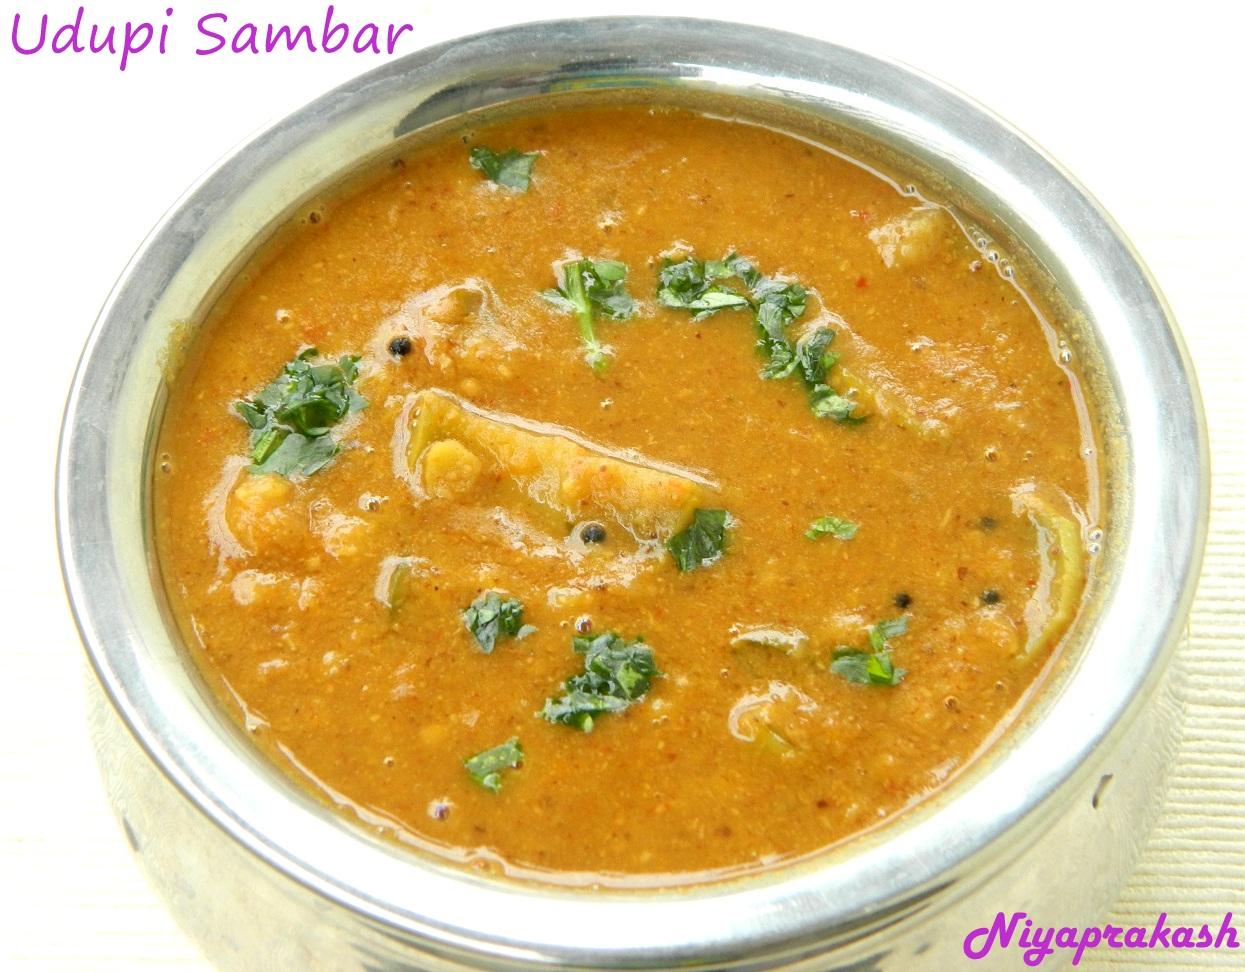 Niyas WorldUdupi Sambar (with coconut paste)